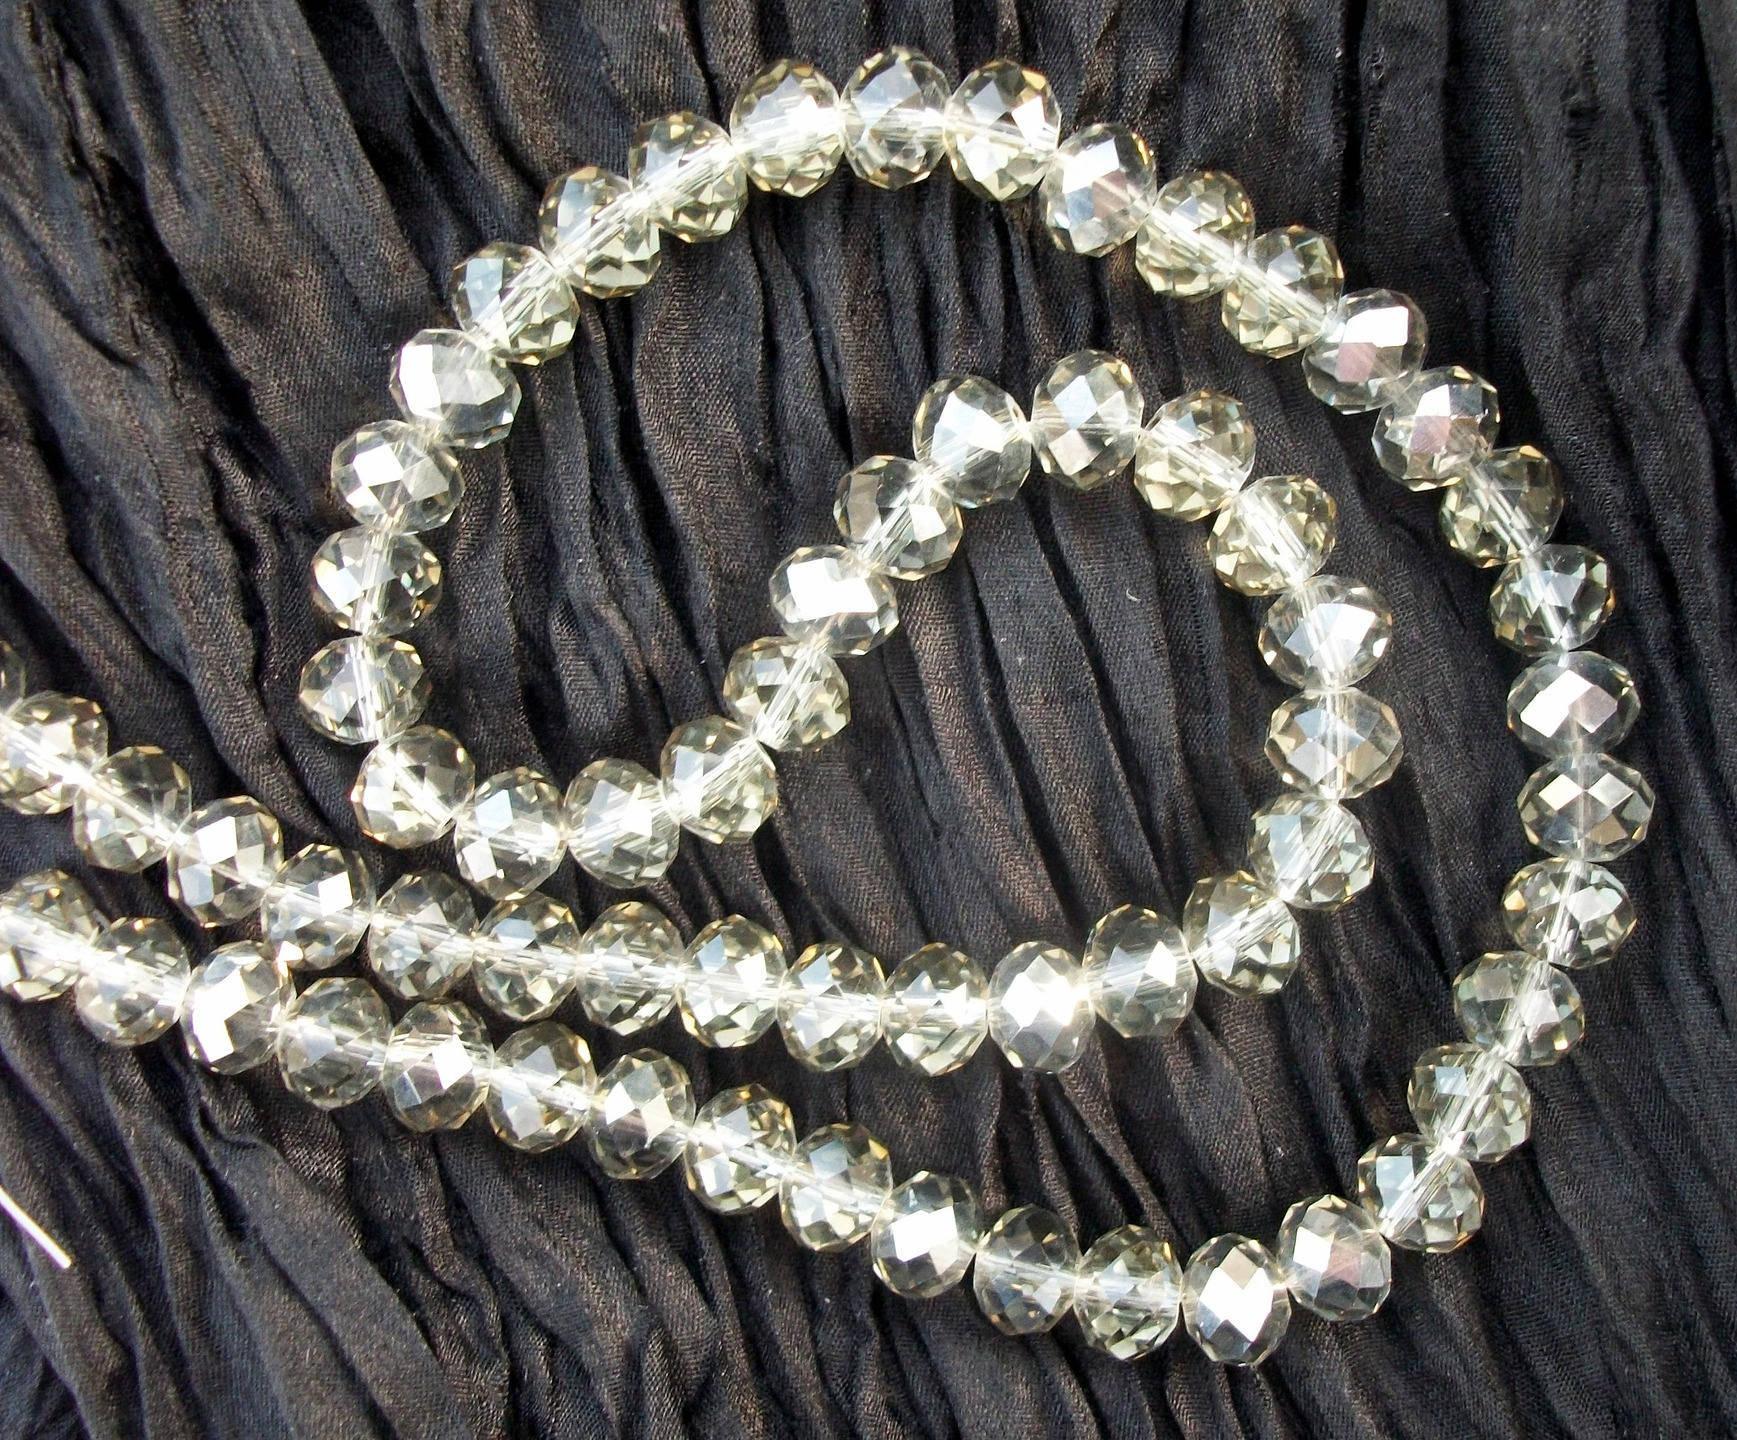 Perles de cristal Swarovski 6 x 8 mm grises irisées (x5)